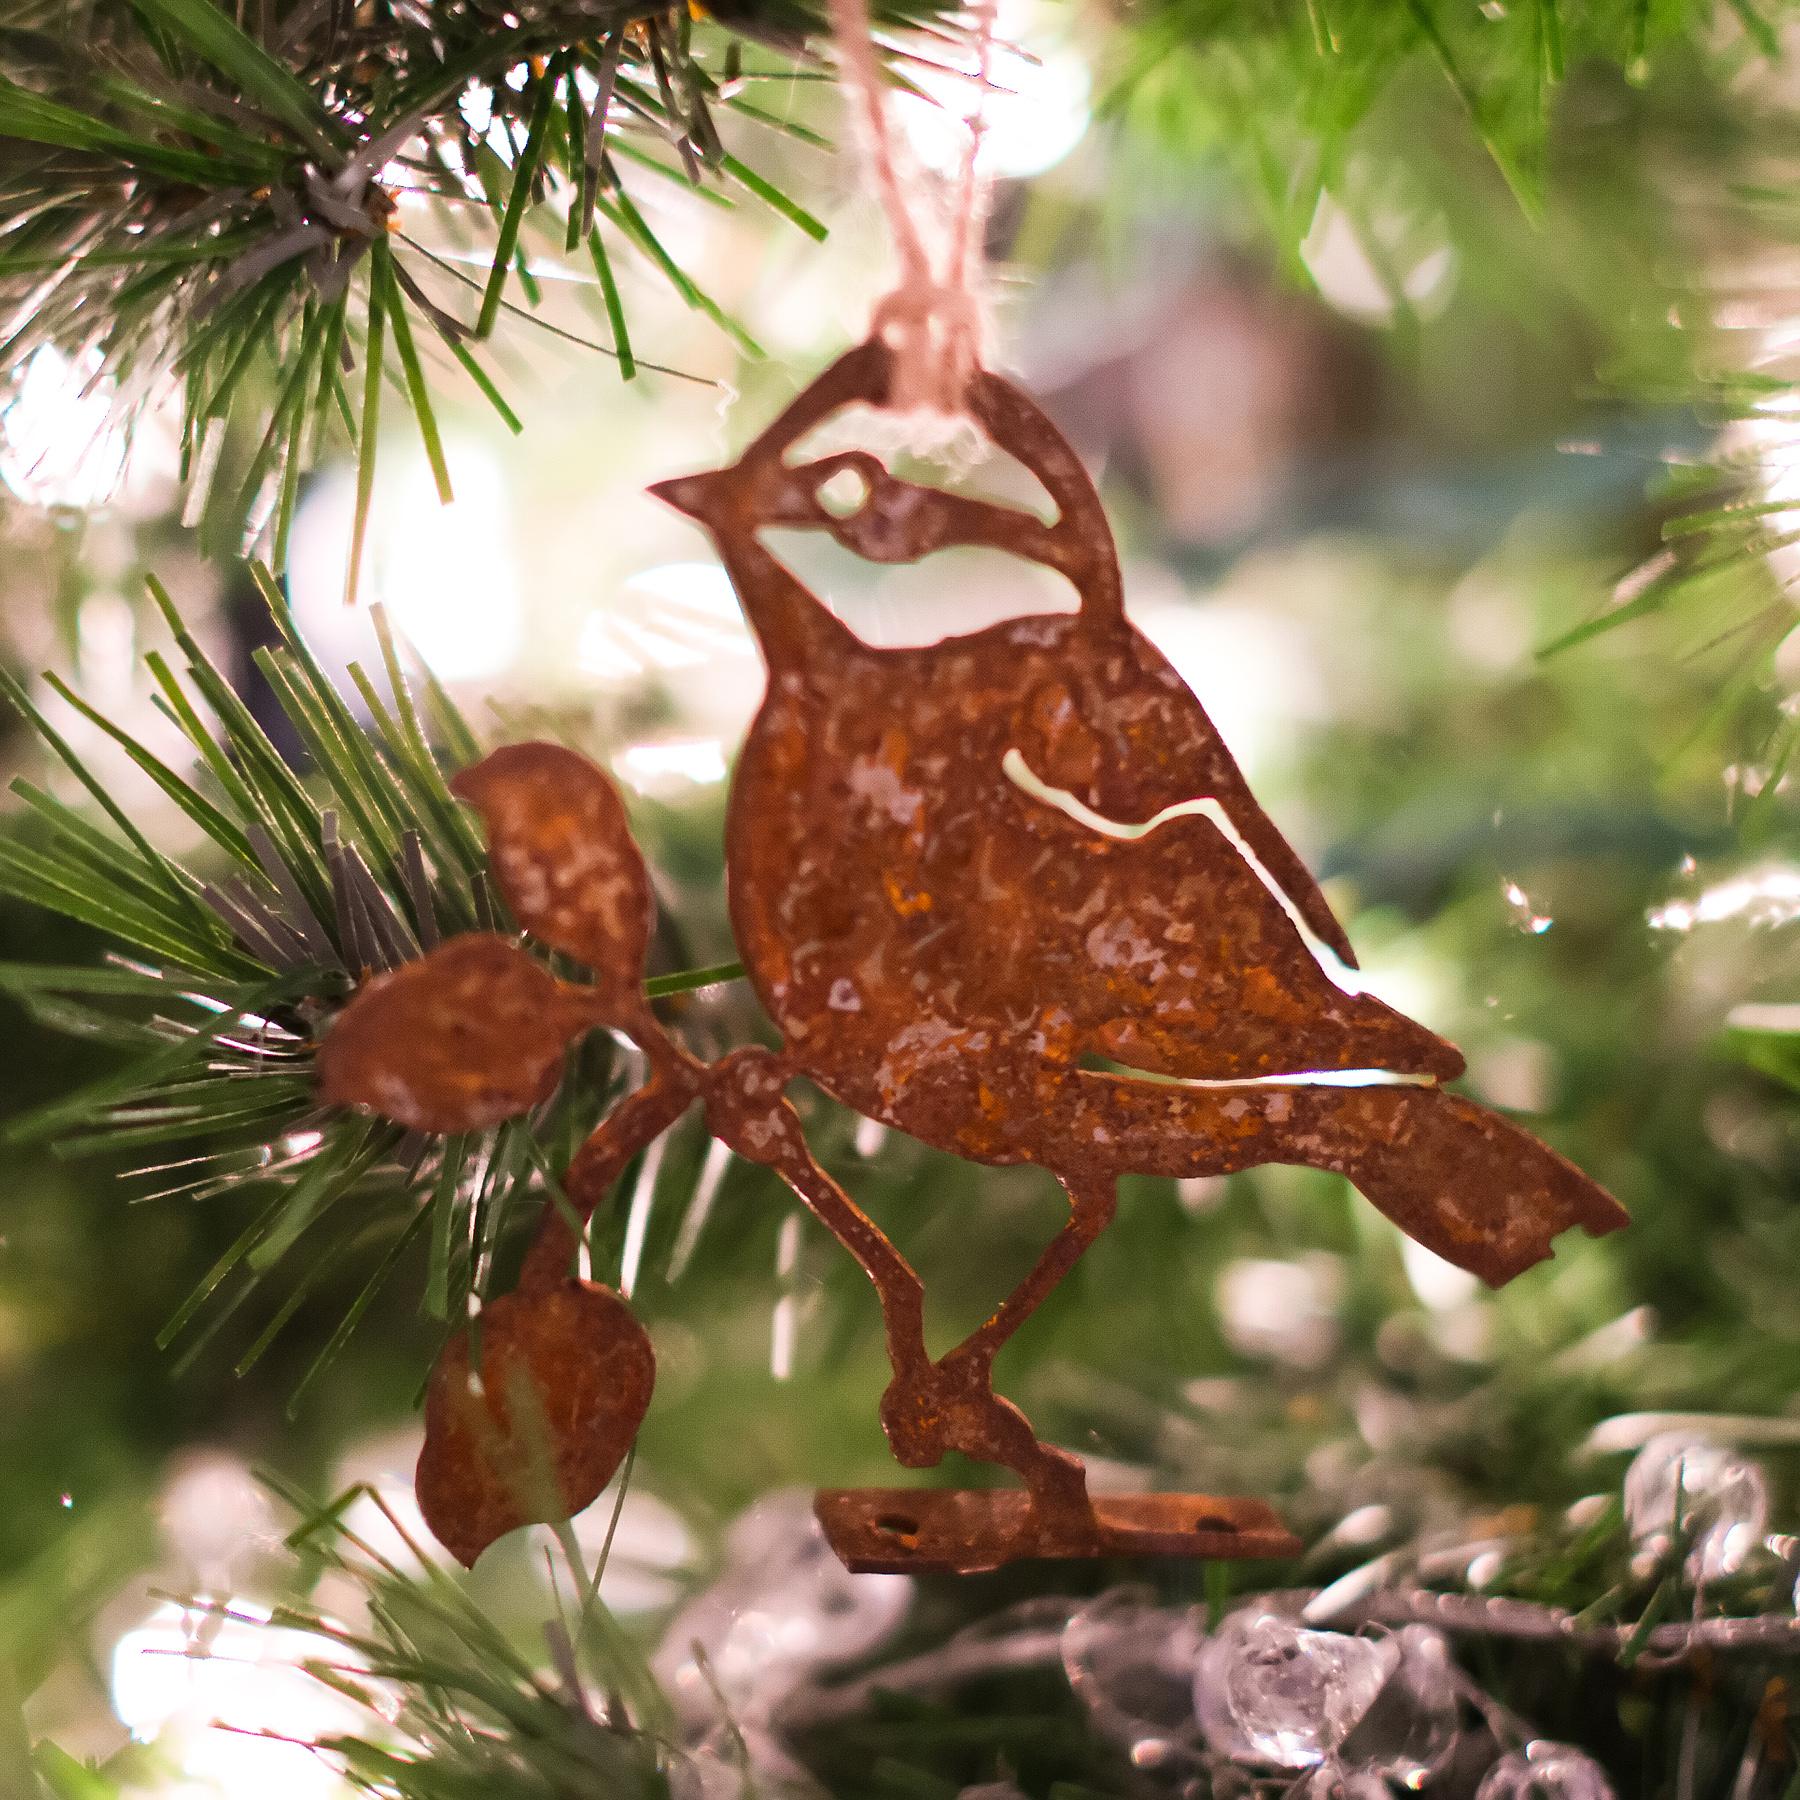 Metal Bird Figurine as Christmas Ornament